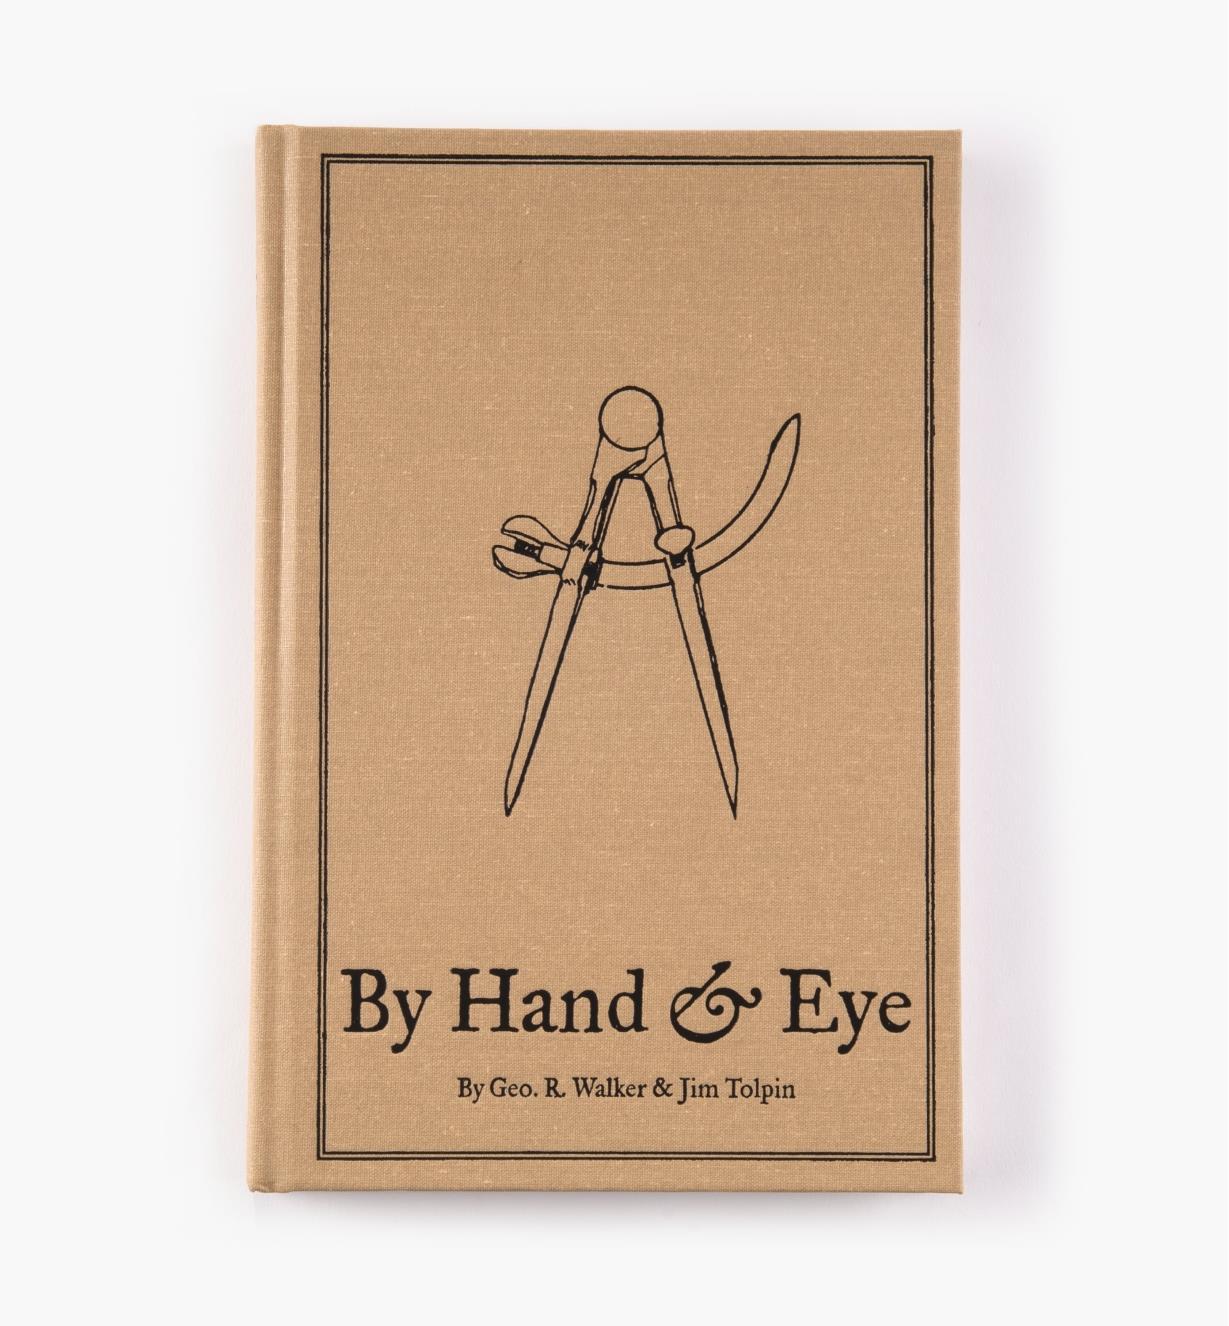 20L0324 - By Hand & Eye